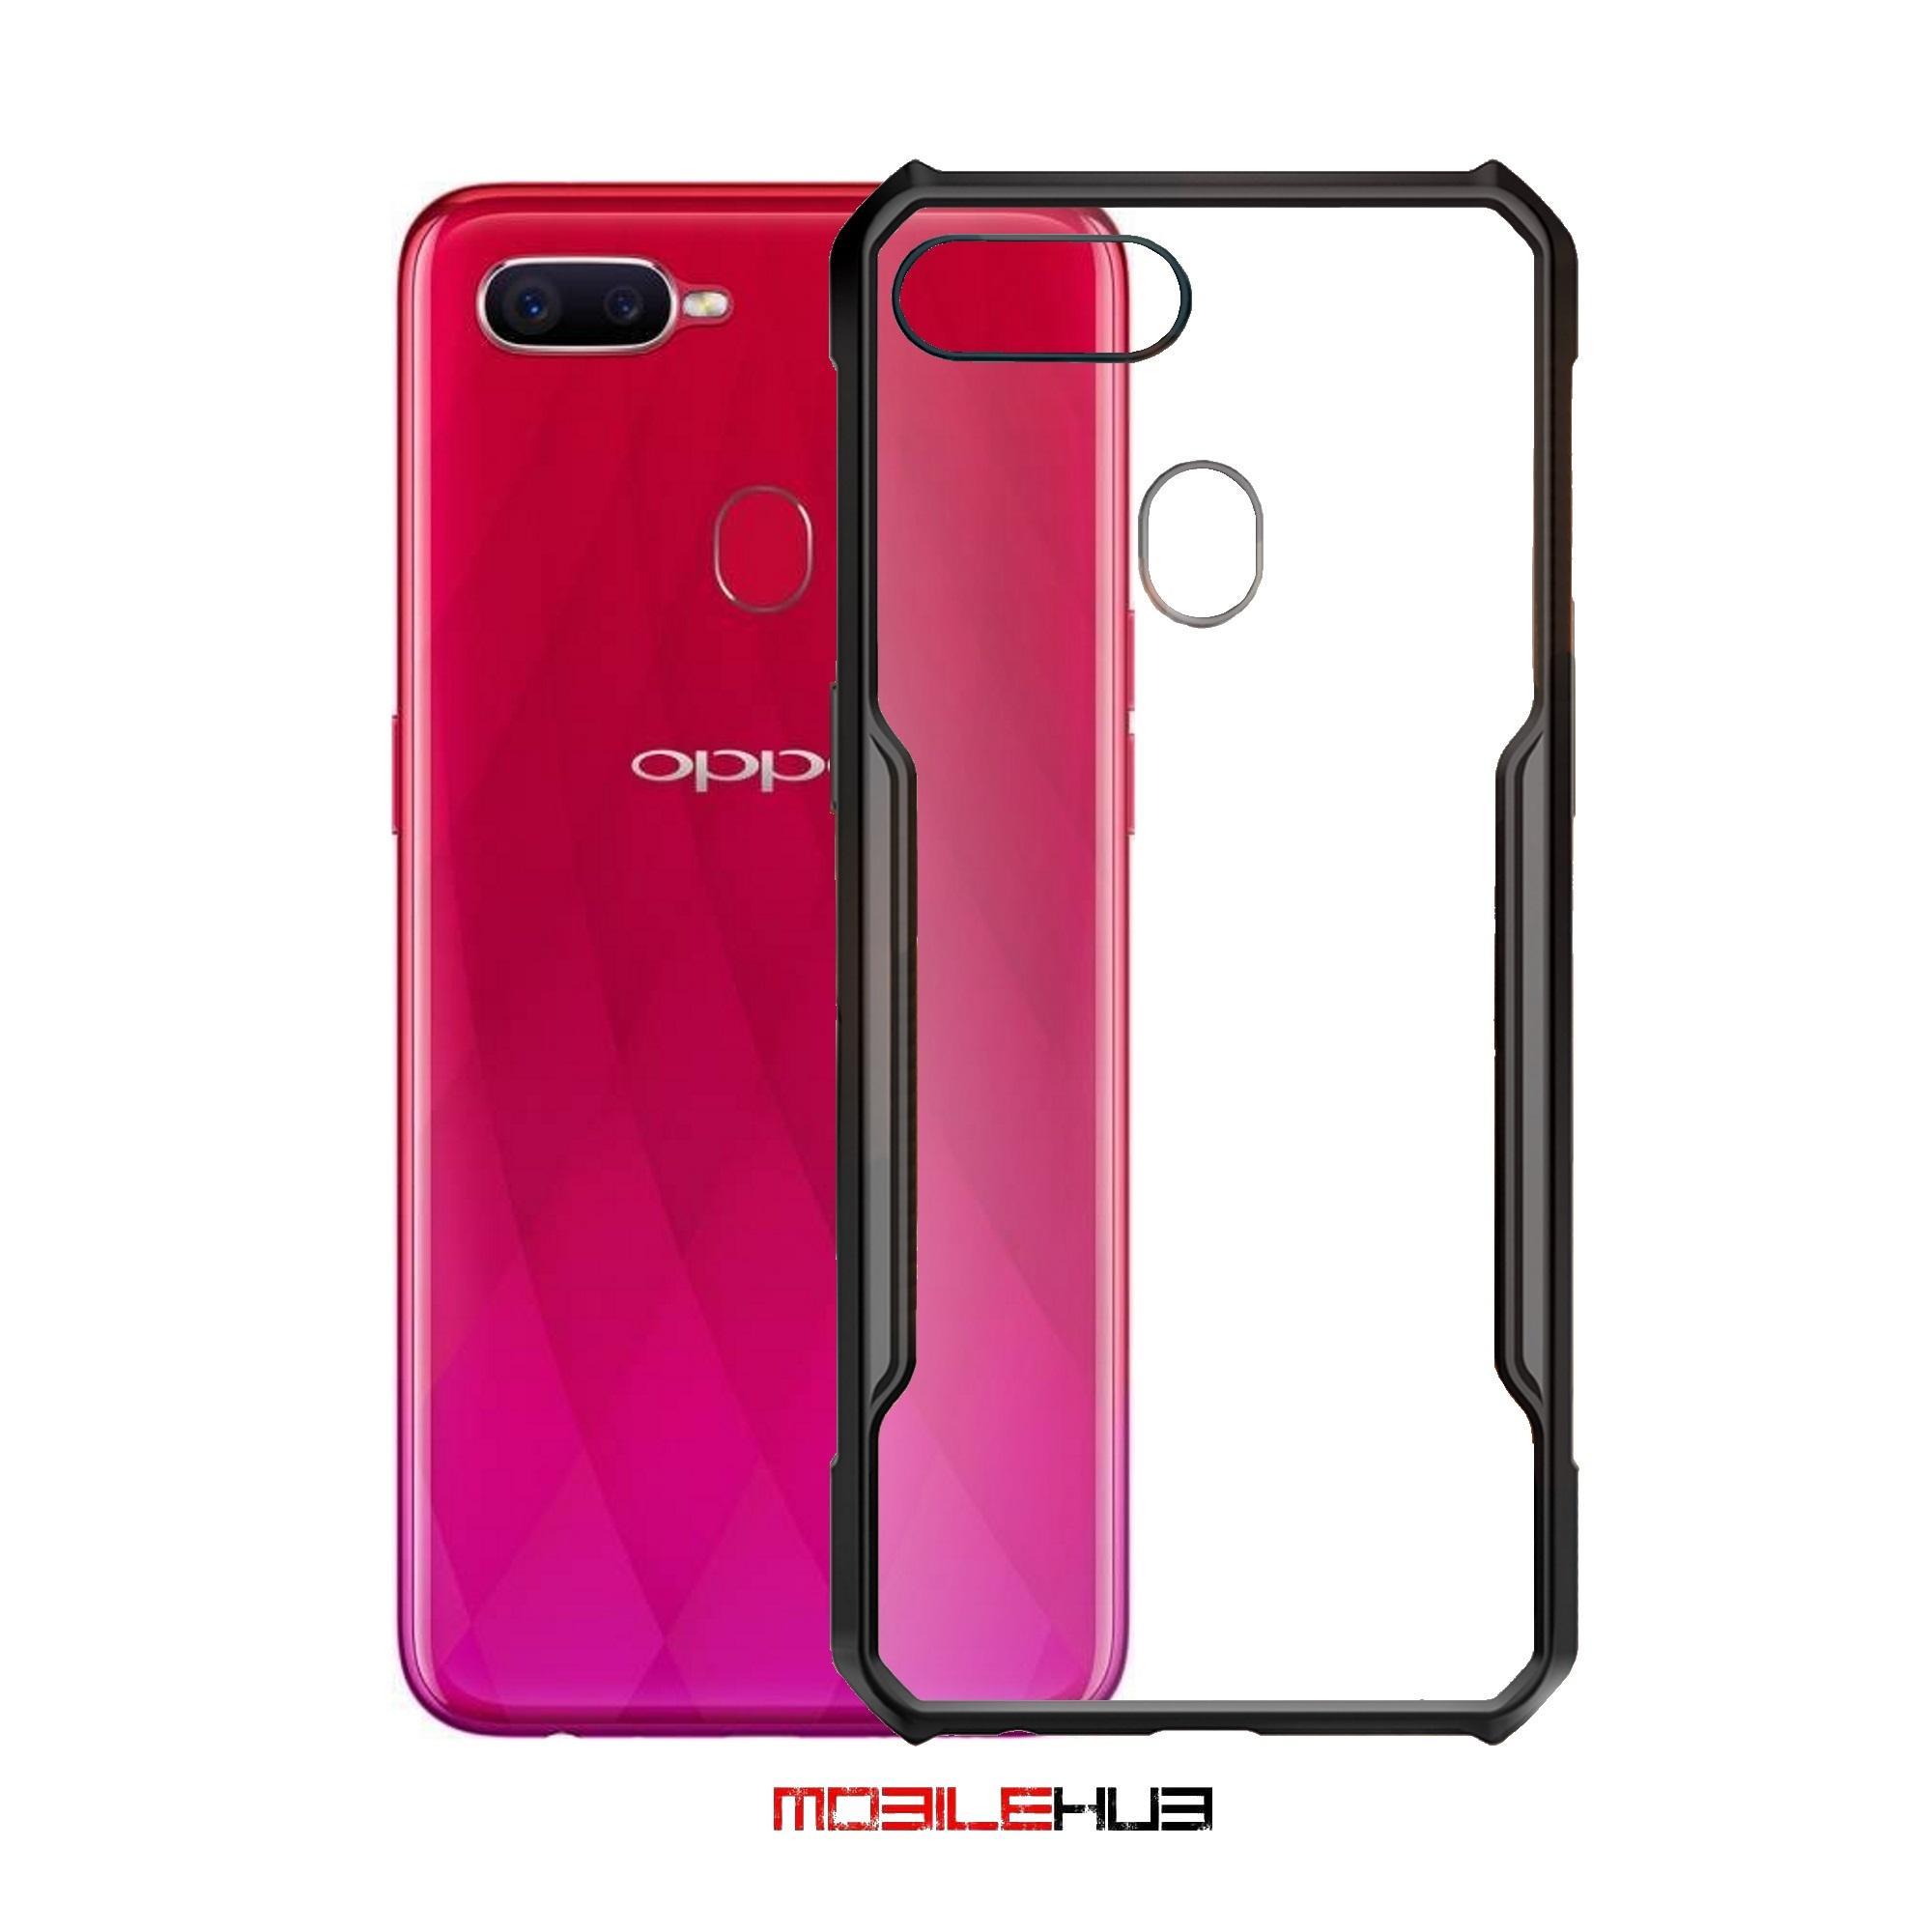 Xundd Philippines Price List Phone Cases For Sale Lazada Slim Case Matte Black Babyskin Xiaomi Redmi 5 Plus 5plus New Hot Type Oppo F9 Urban Armor Gear